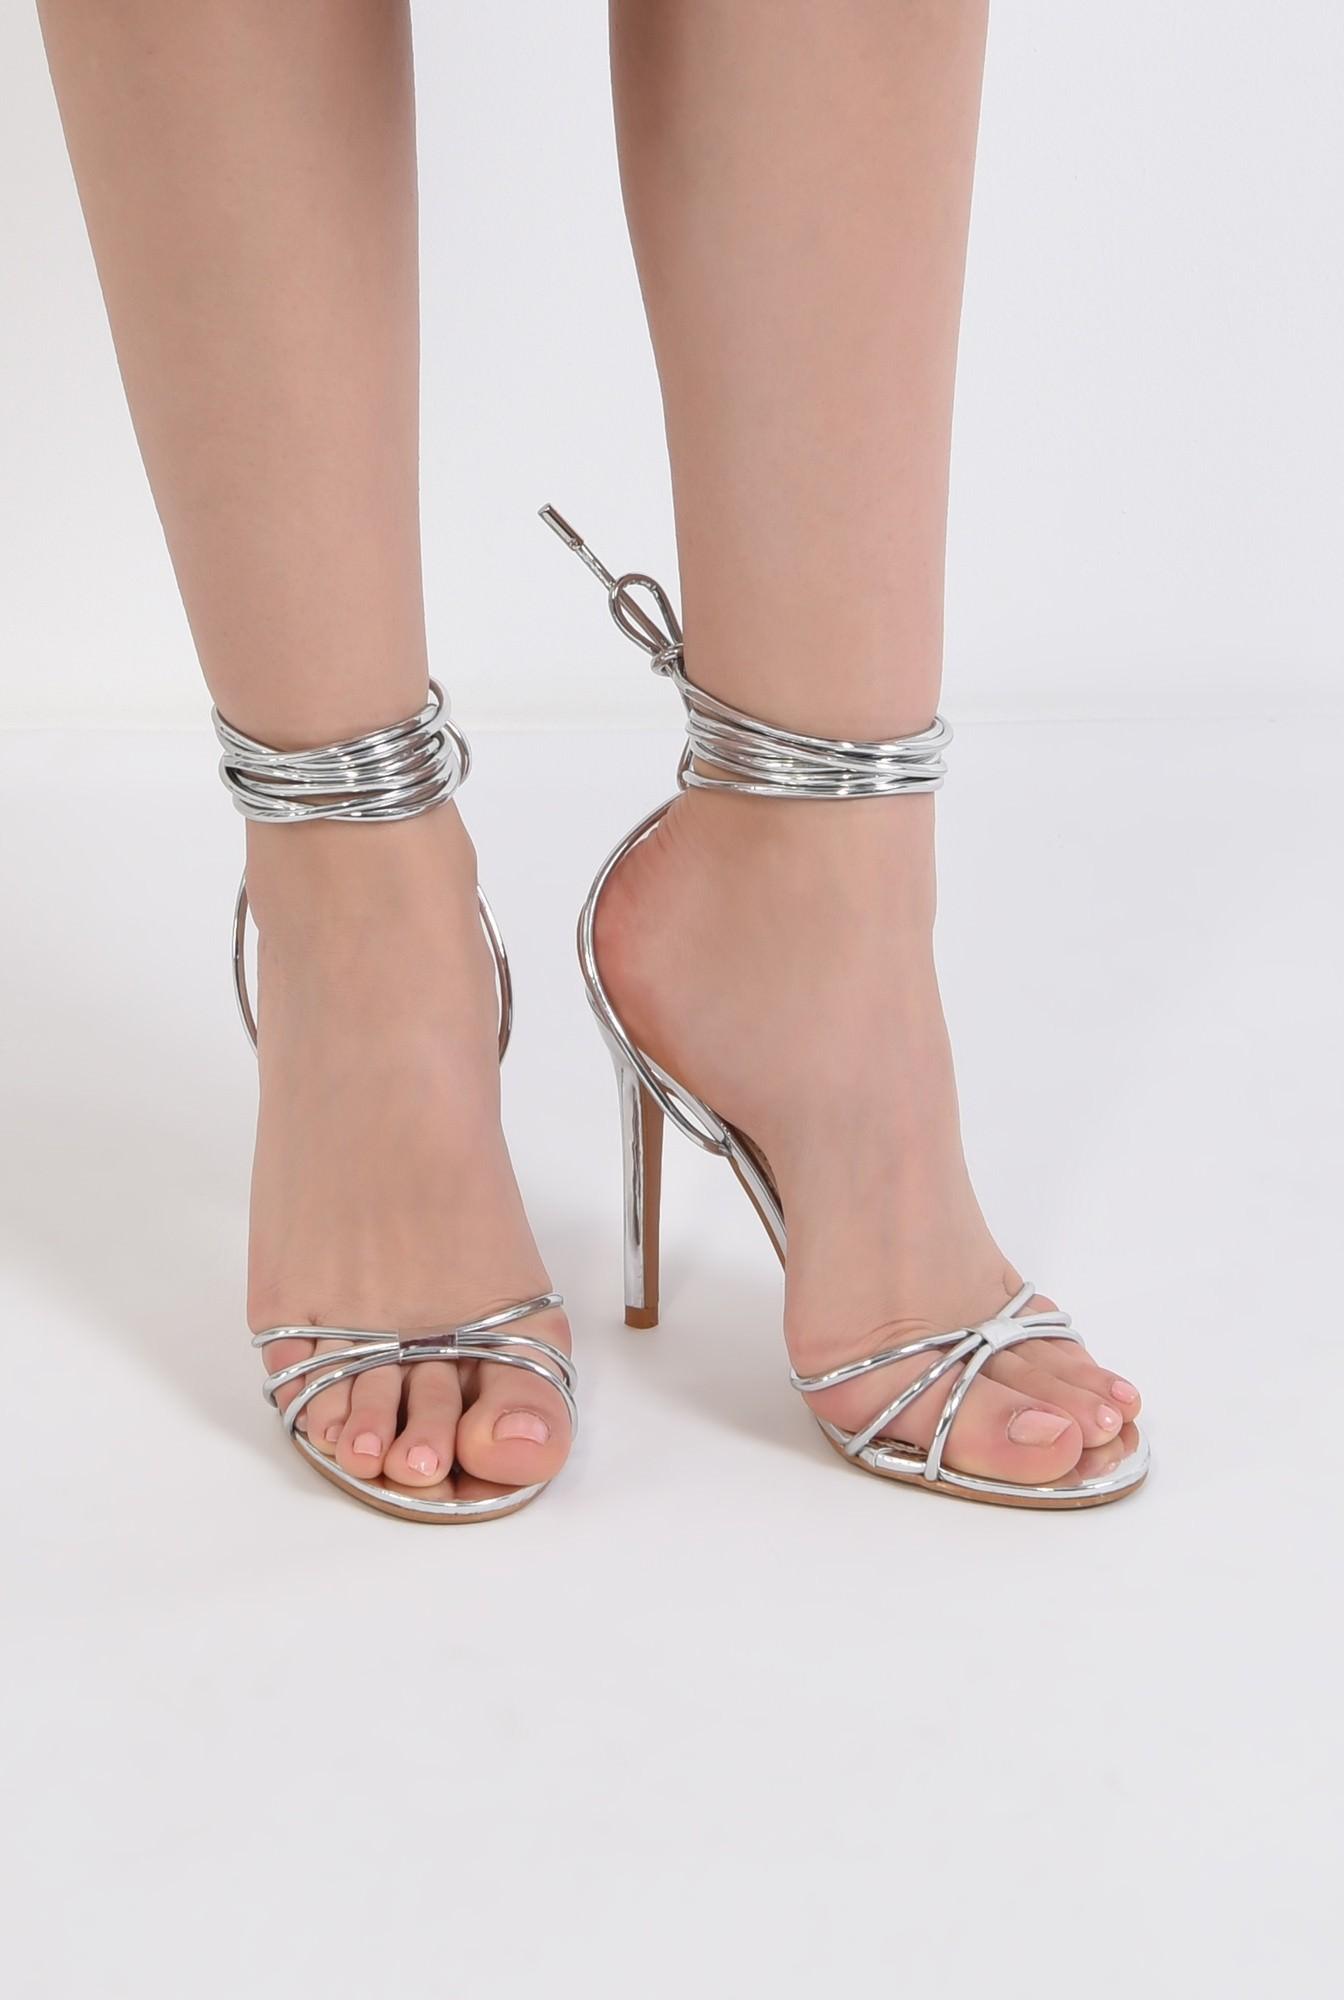 1 - sandale elegante, argintii, cu snur, stiletto